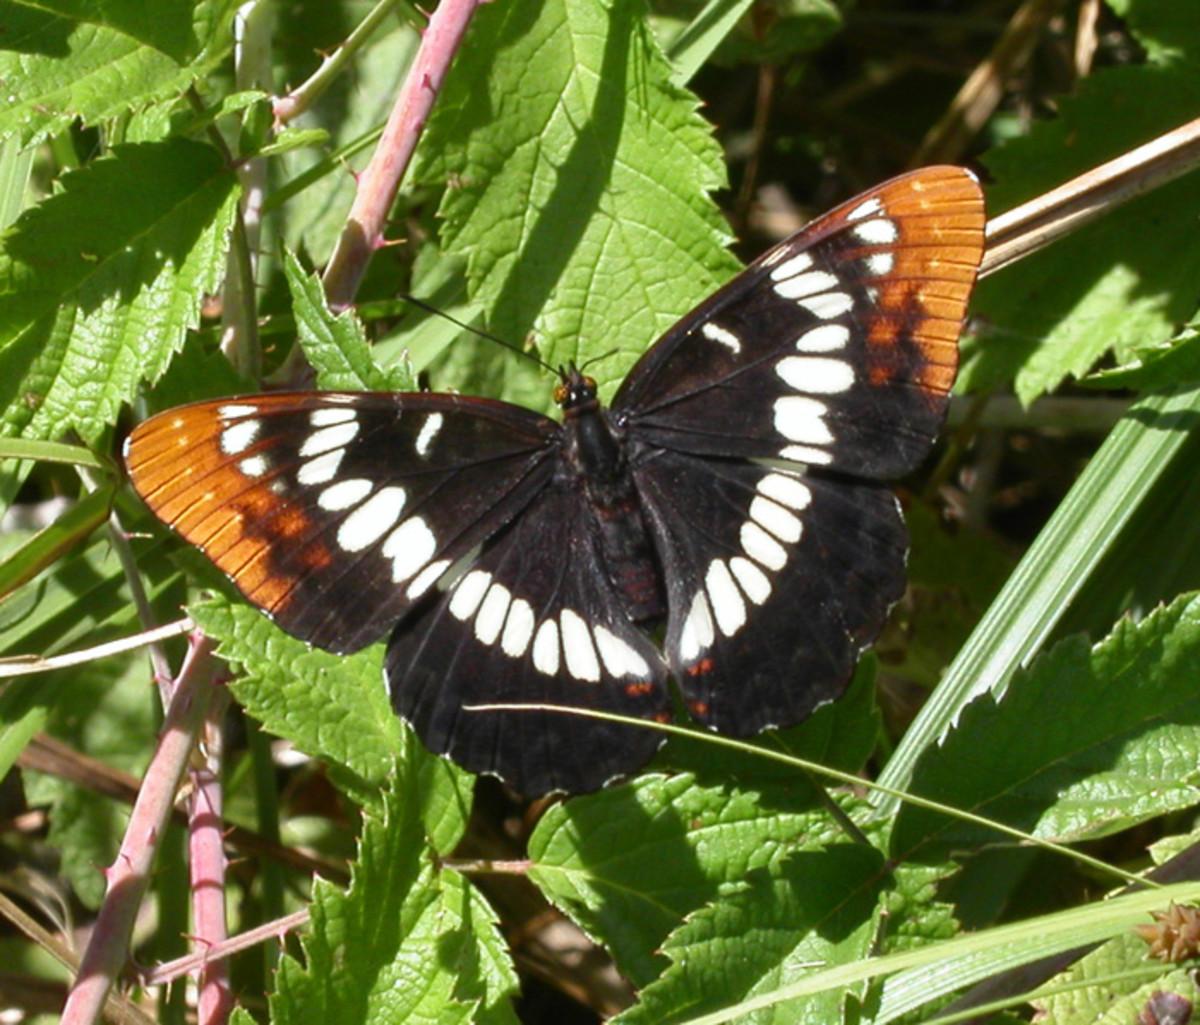 Photo taken at Lodi Lake in Lodi, California. Lorquin's Admiral Butterfly,